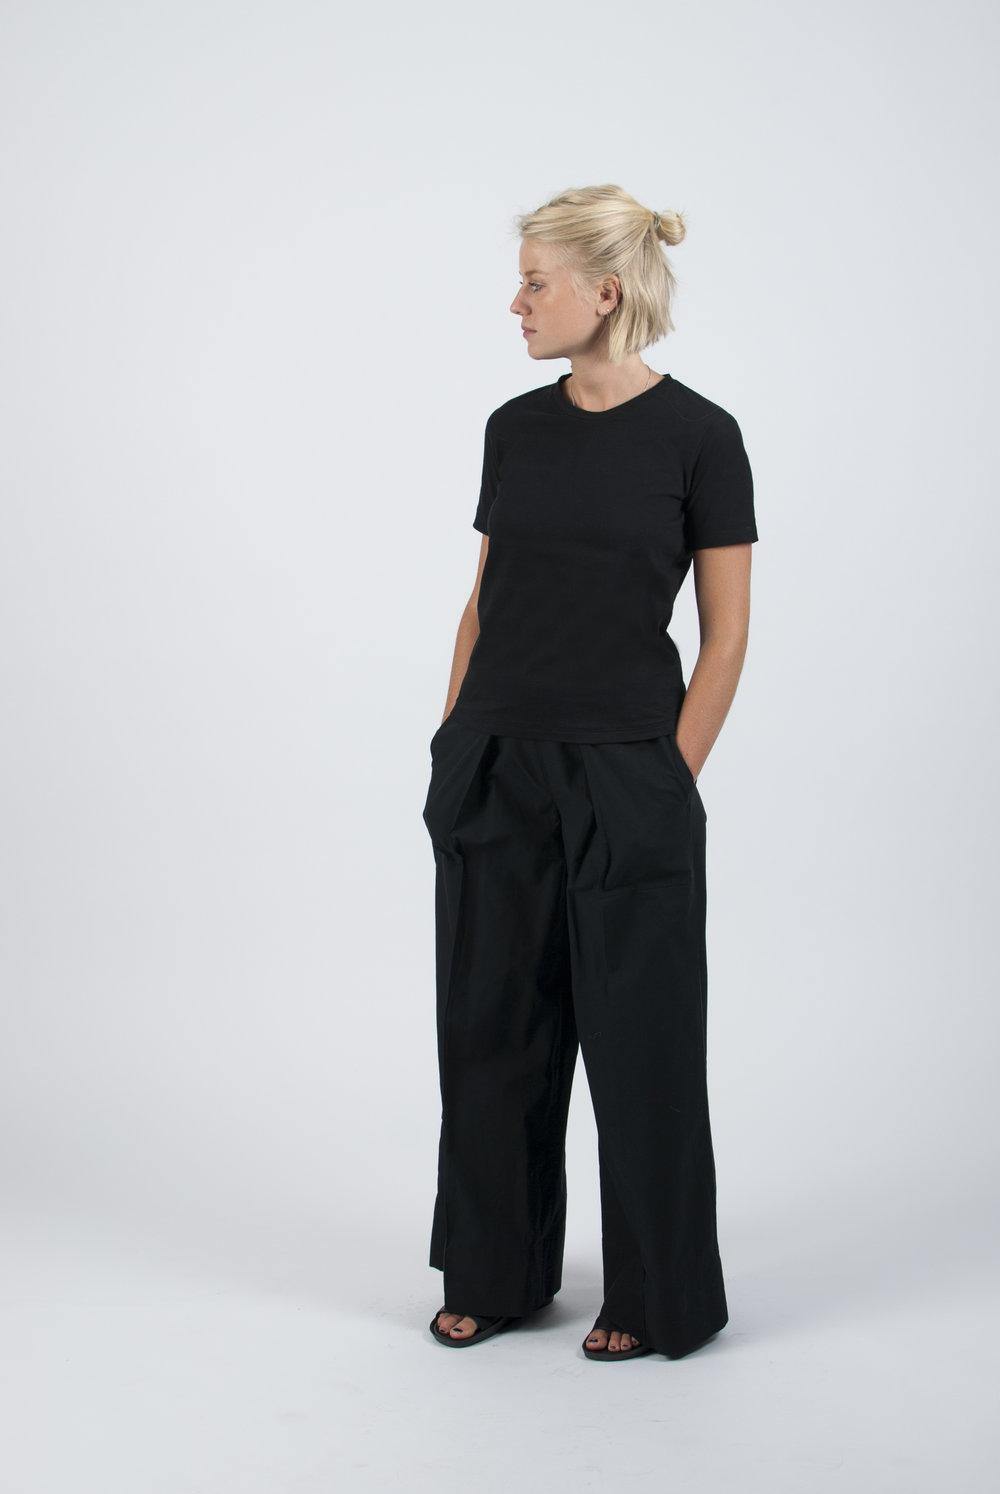 Veryan organic cotton t-shirt